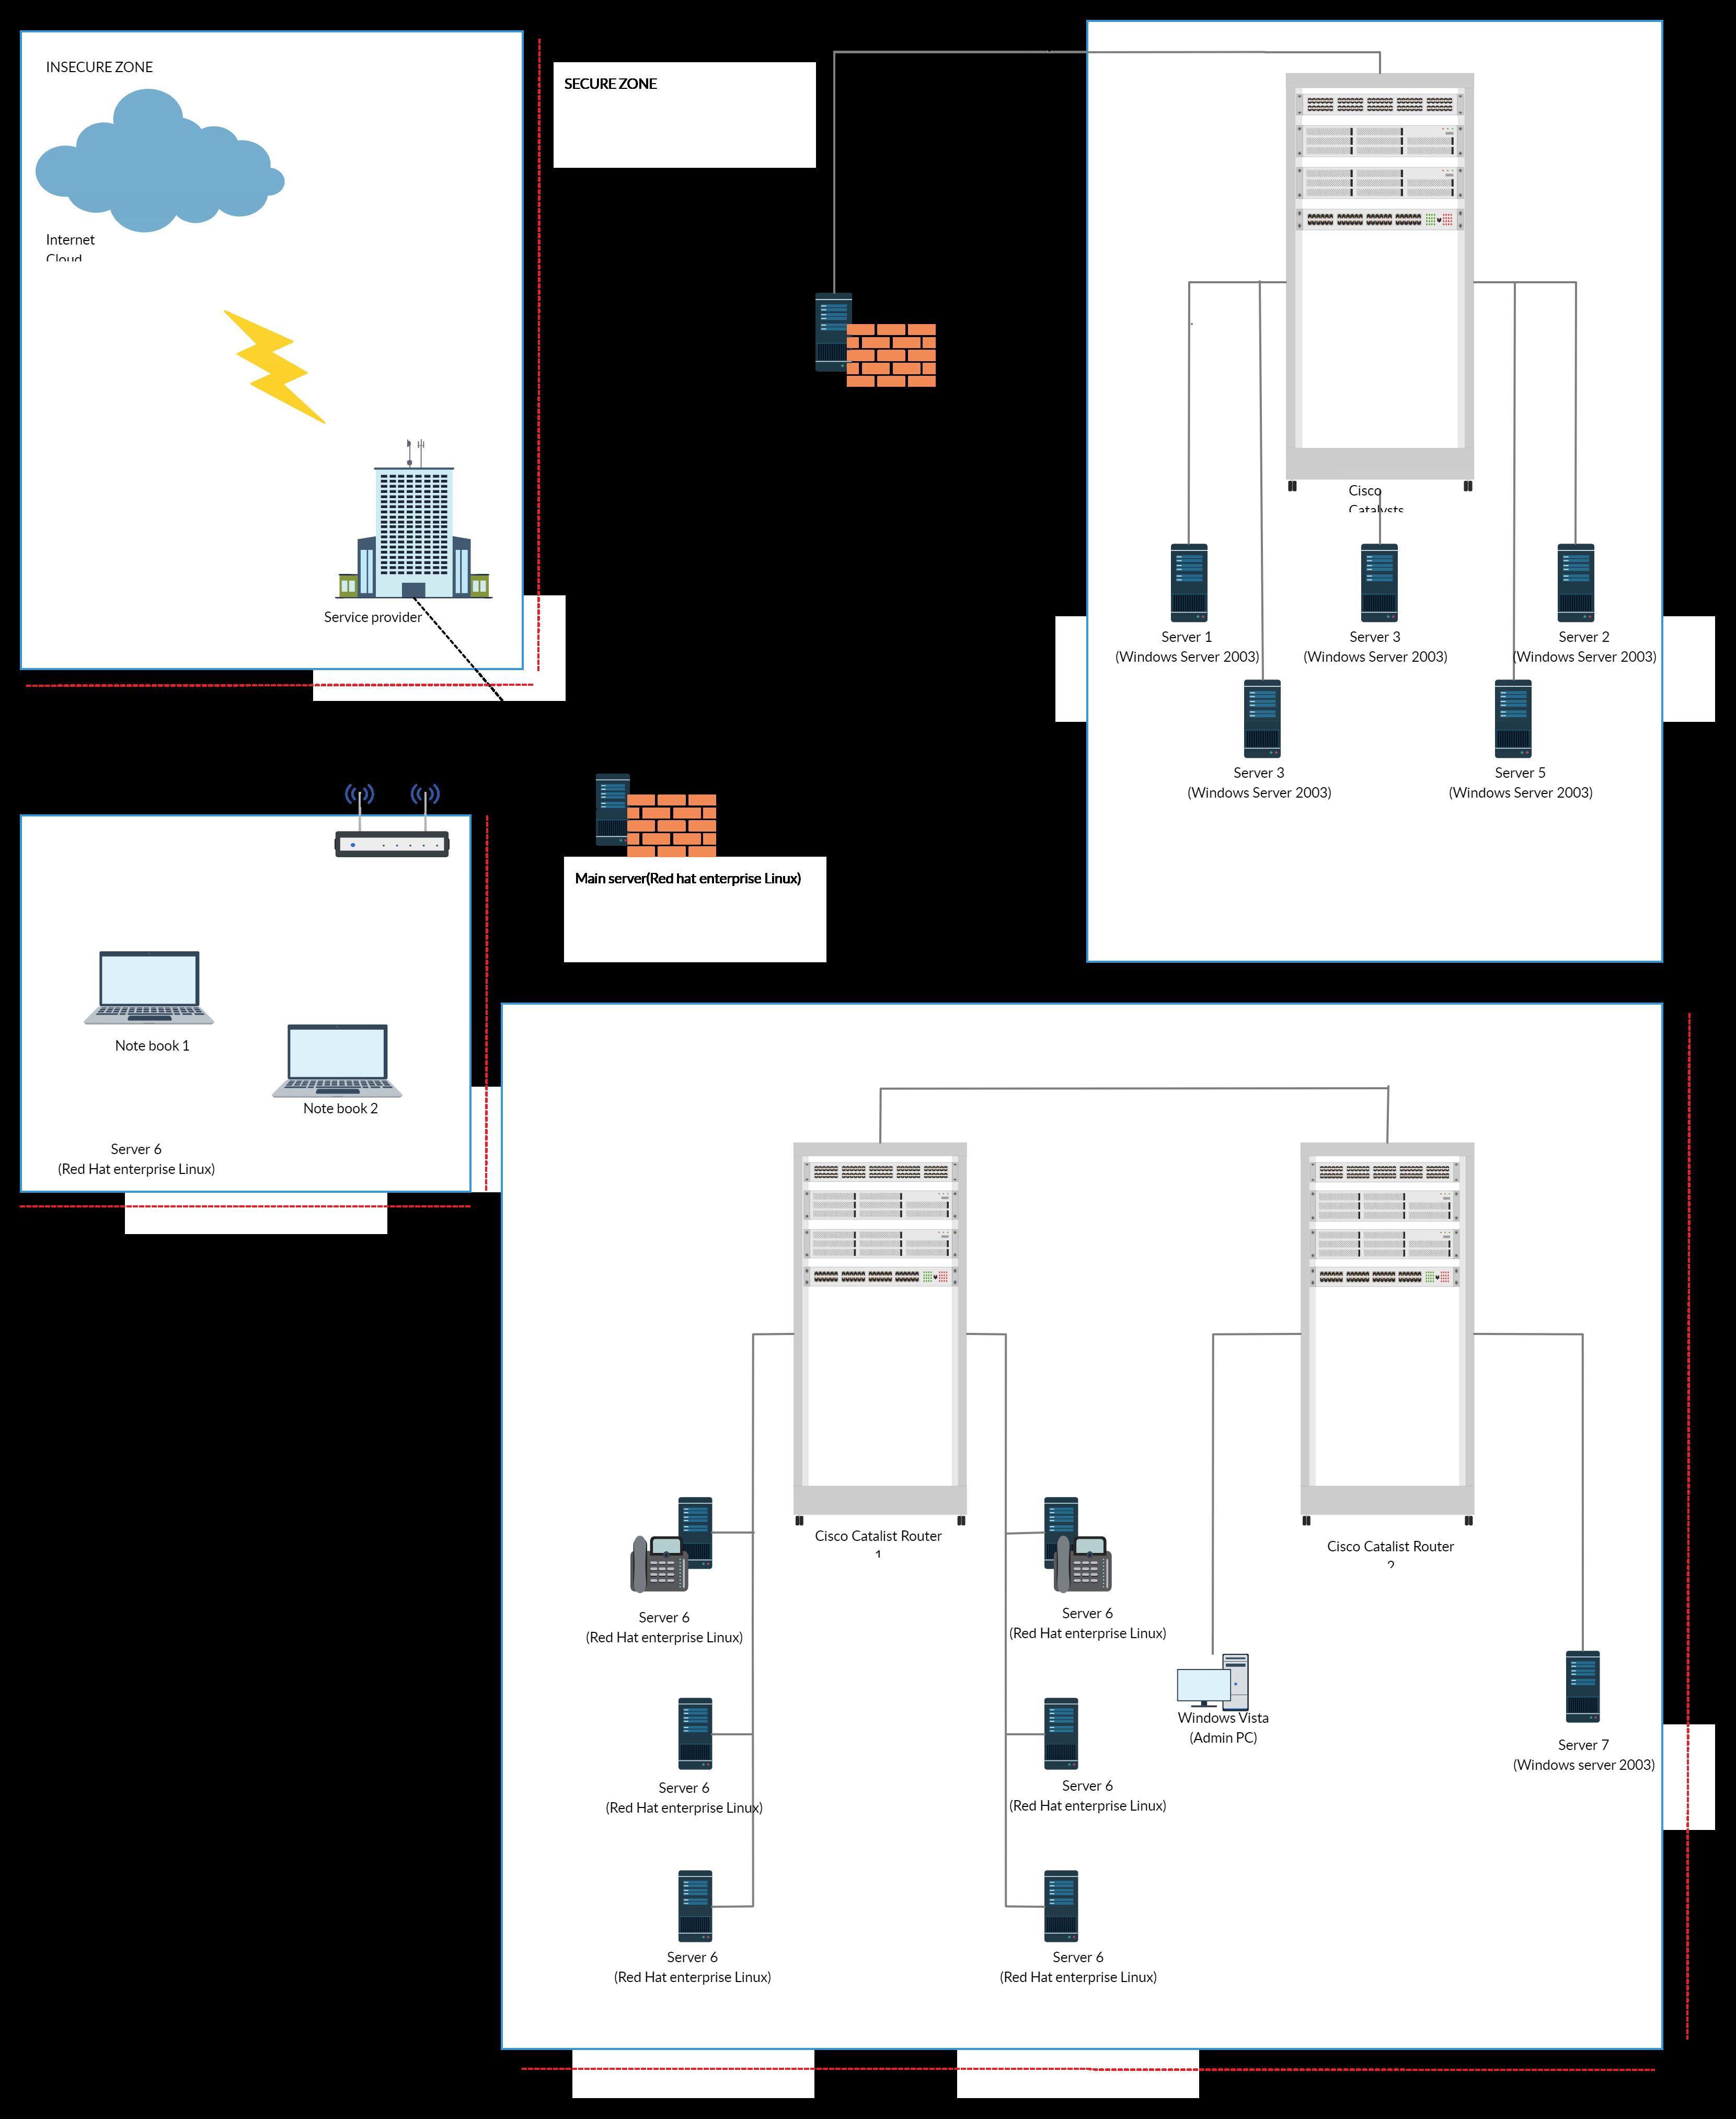 Vlan Network Diagram Diagram Networking Local Area Network